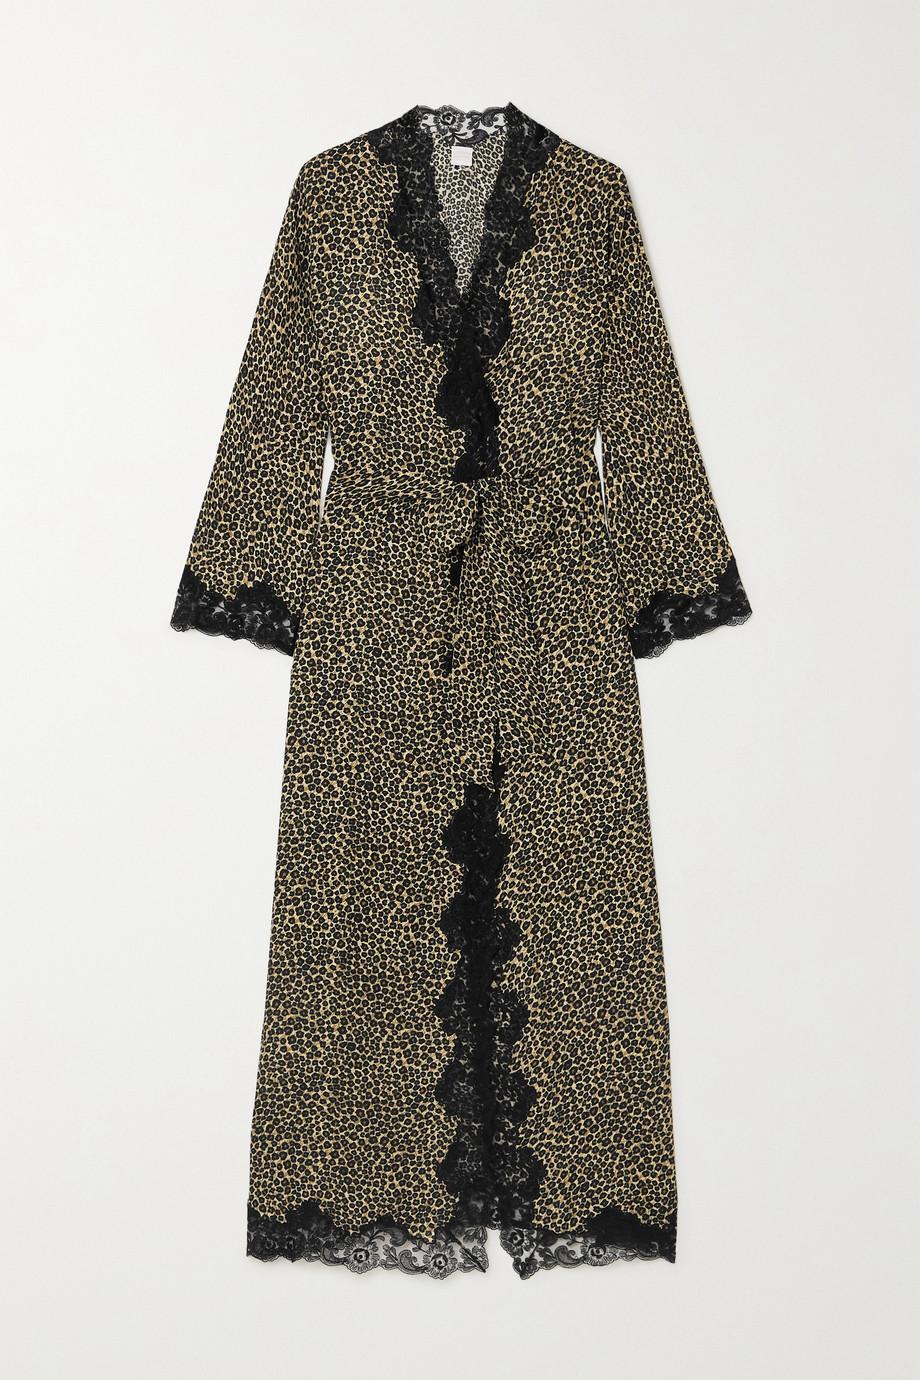 Loretta Caponi Greta lace-trimmed leopard-print silk-georgette robe